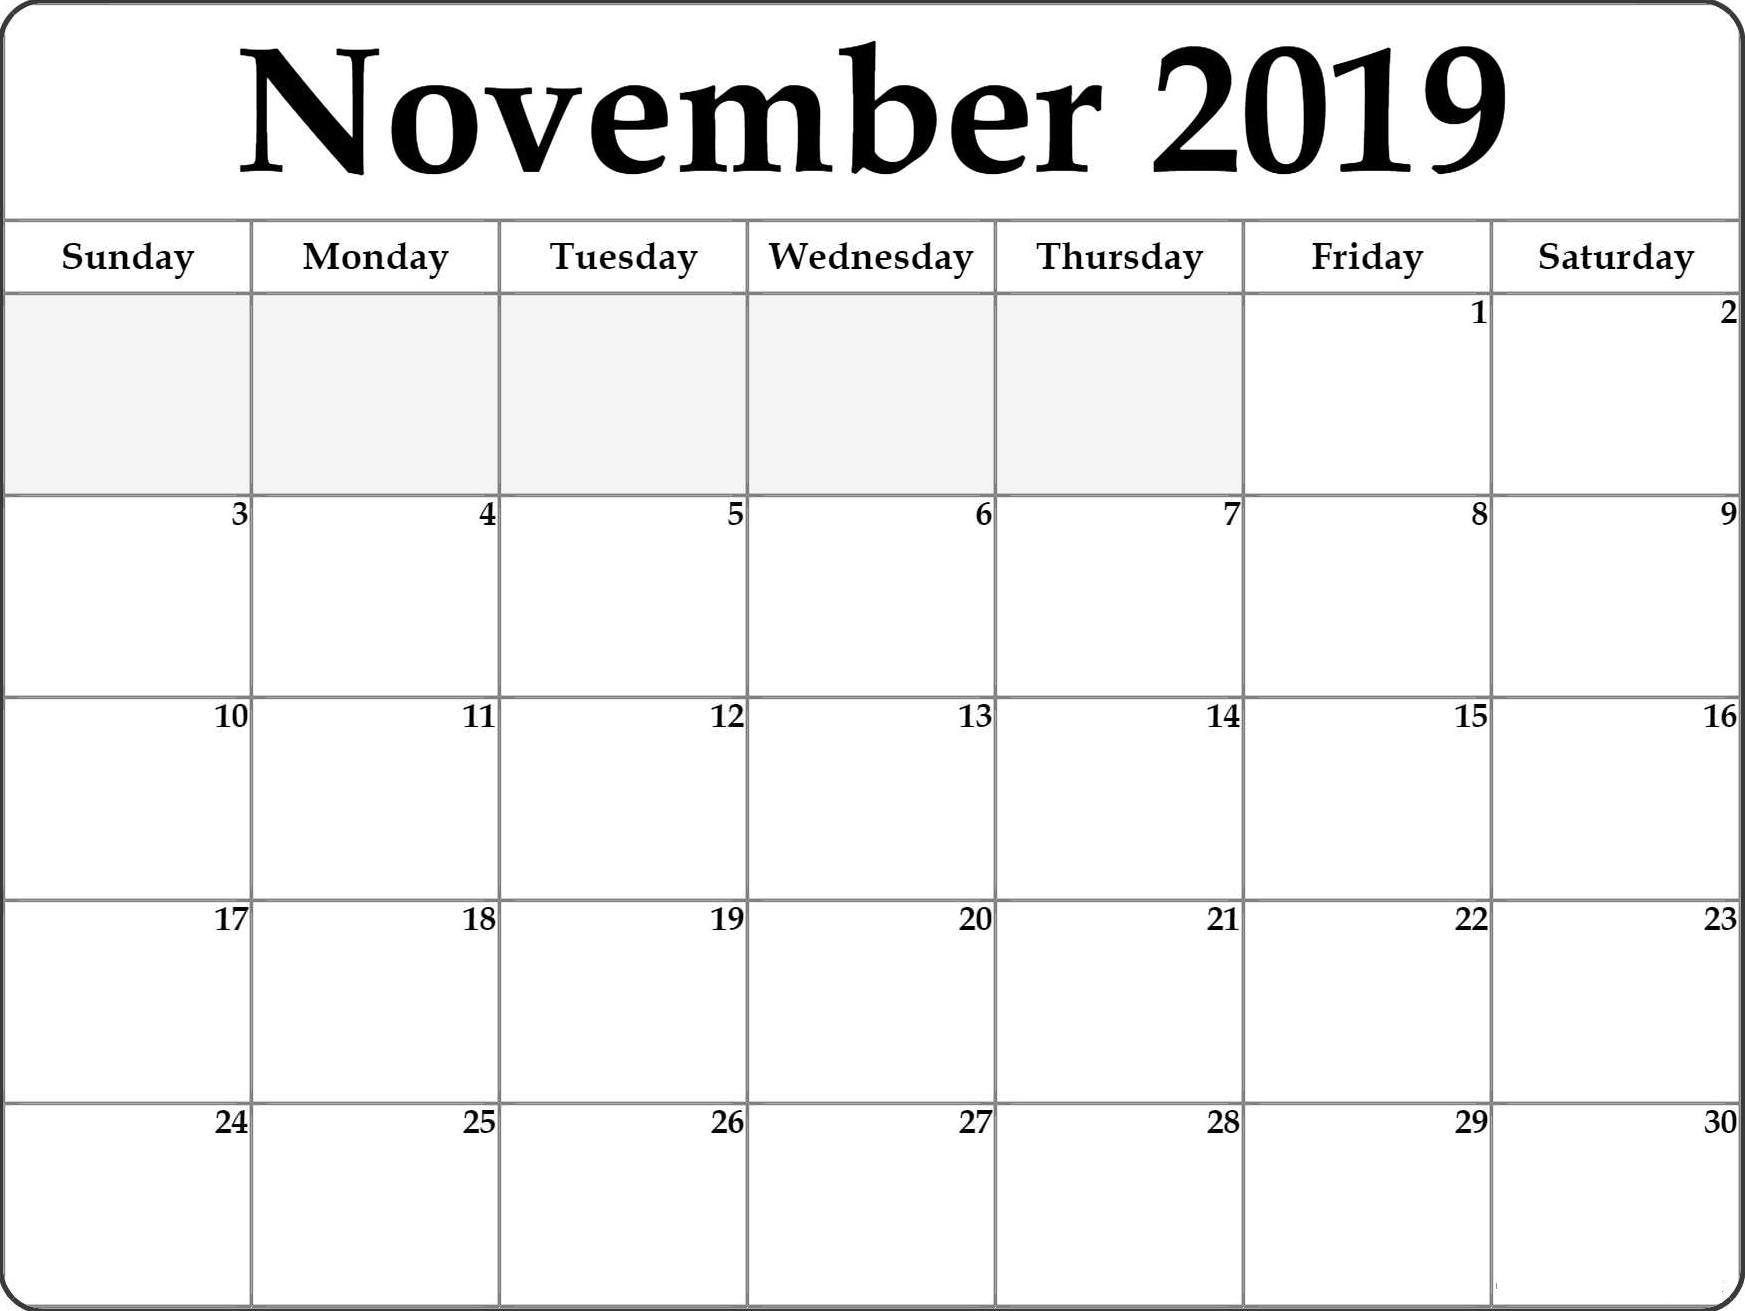 Free November Calendar 2019 Print Out - Set Your Plan